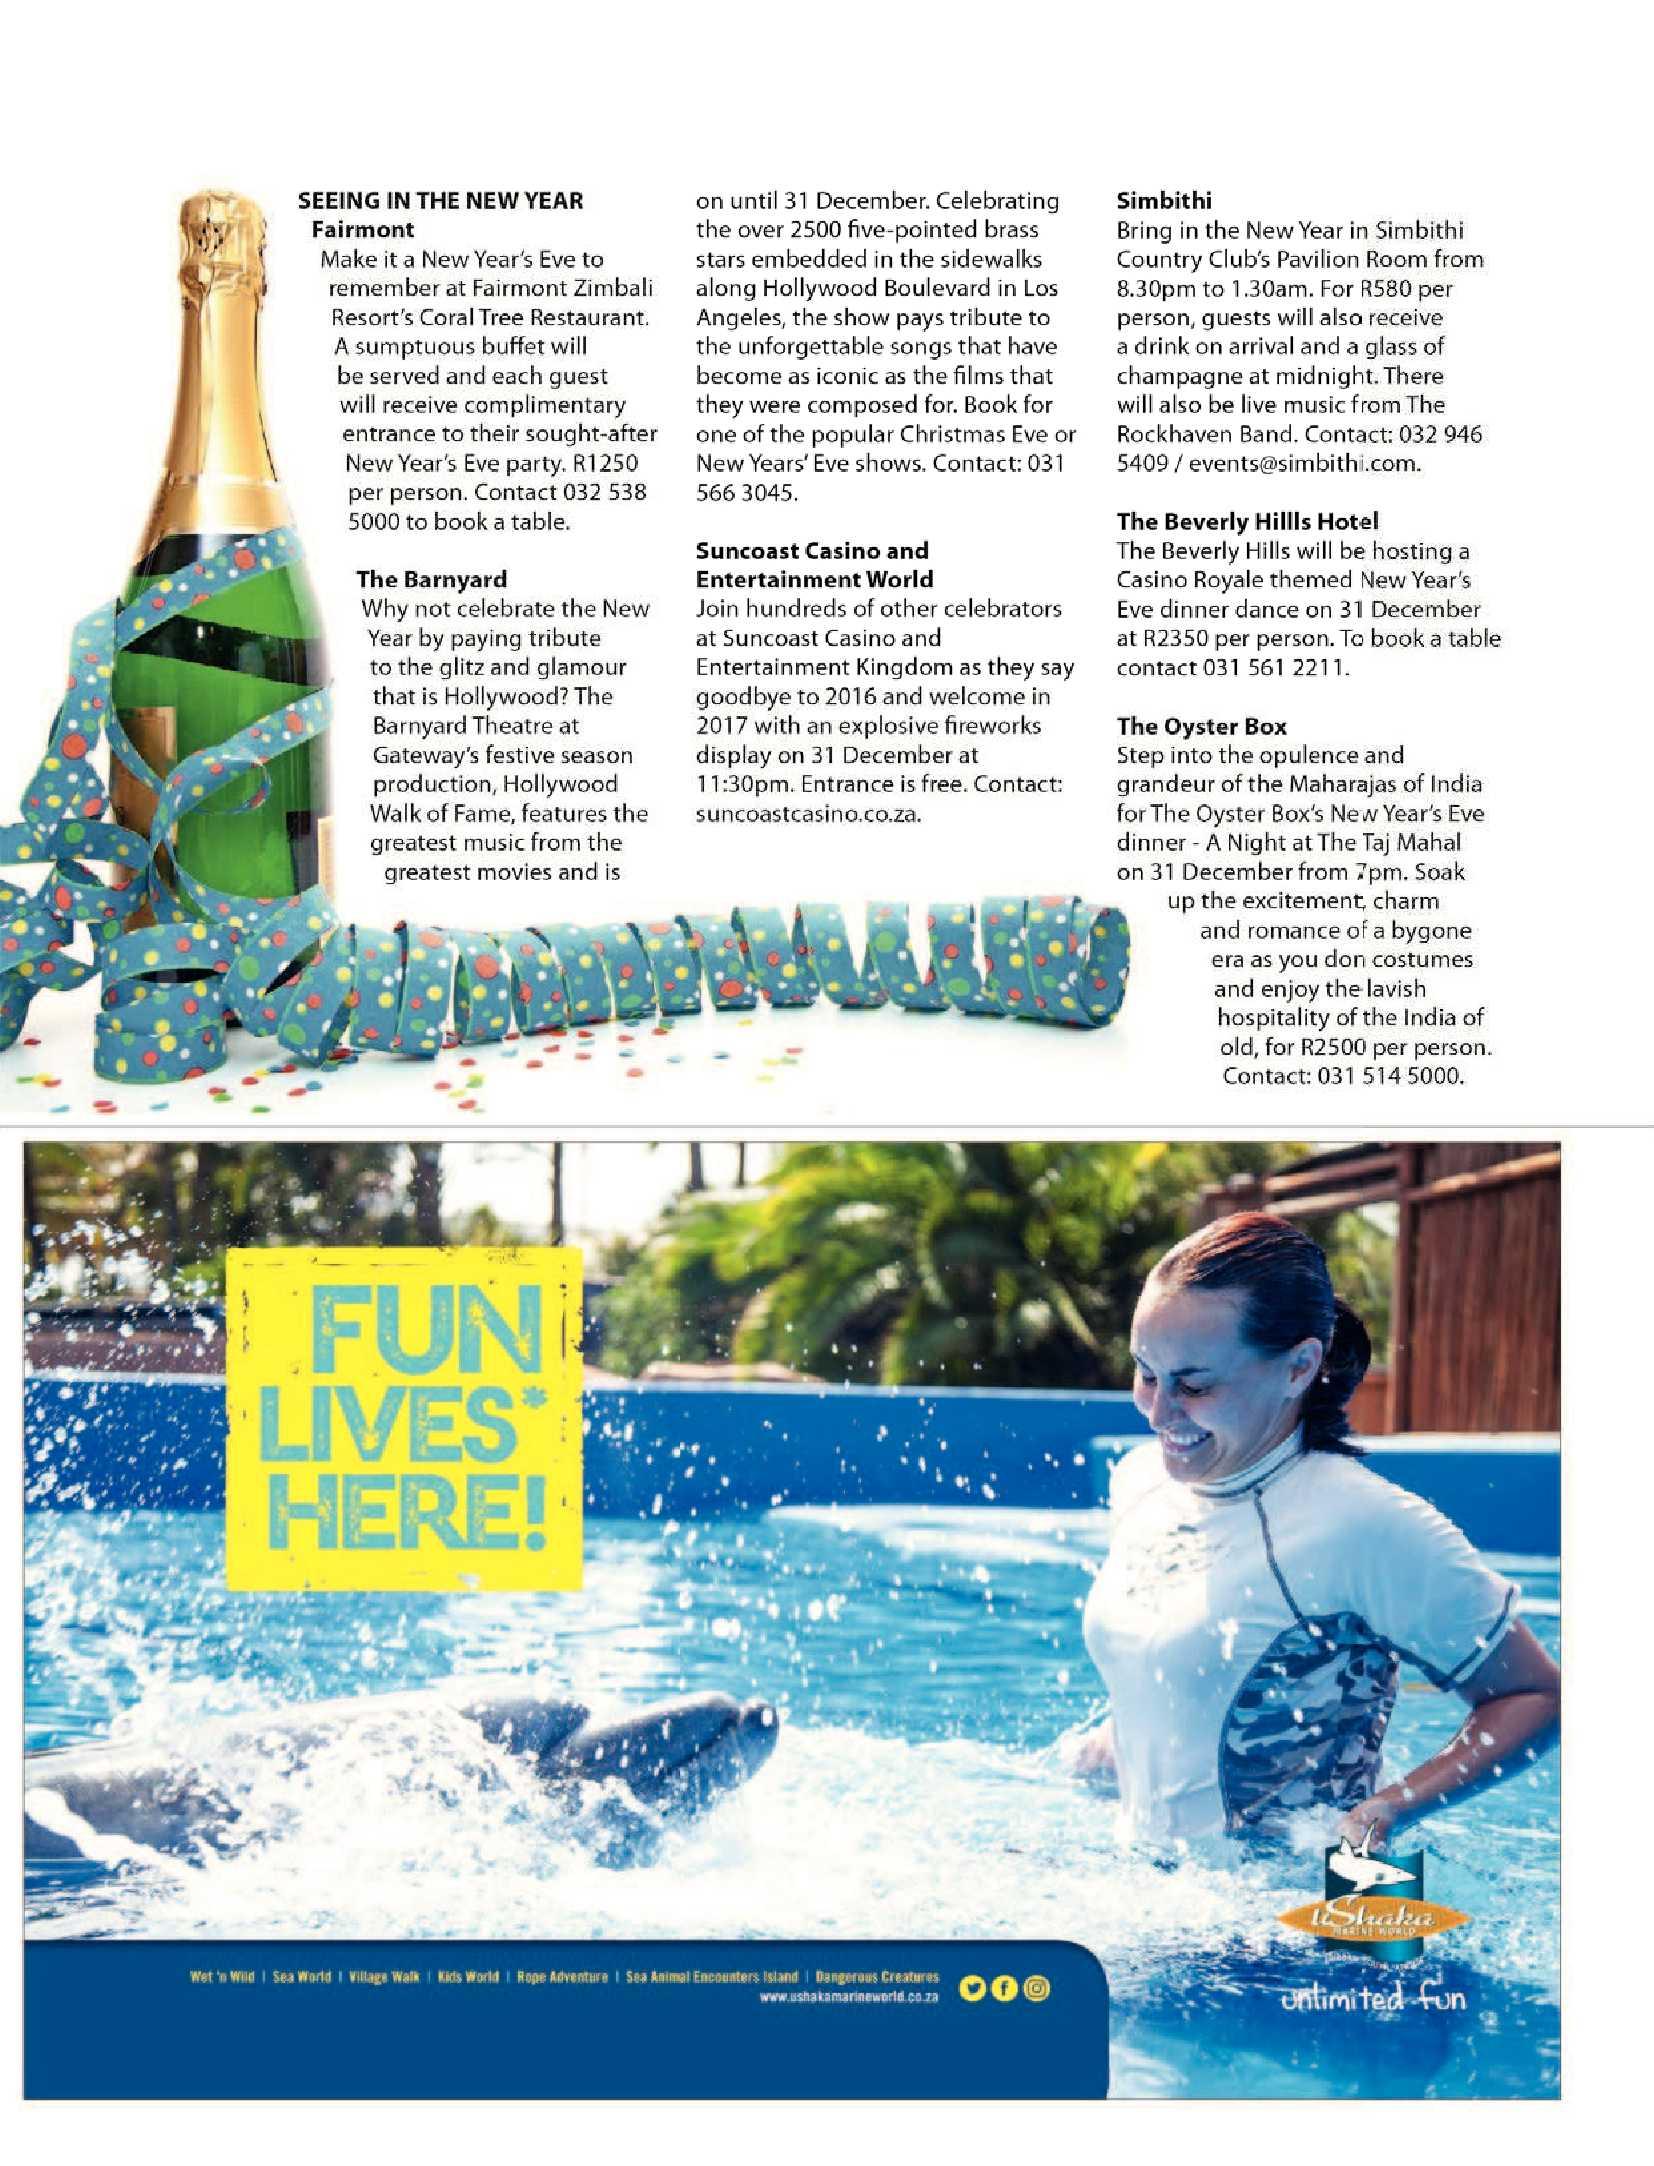 get-magazine-ballitoumhlanga-december-2016-january-2017-epapers-page-36